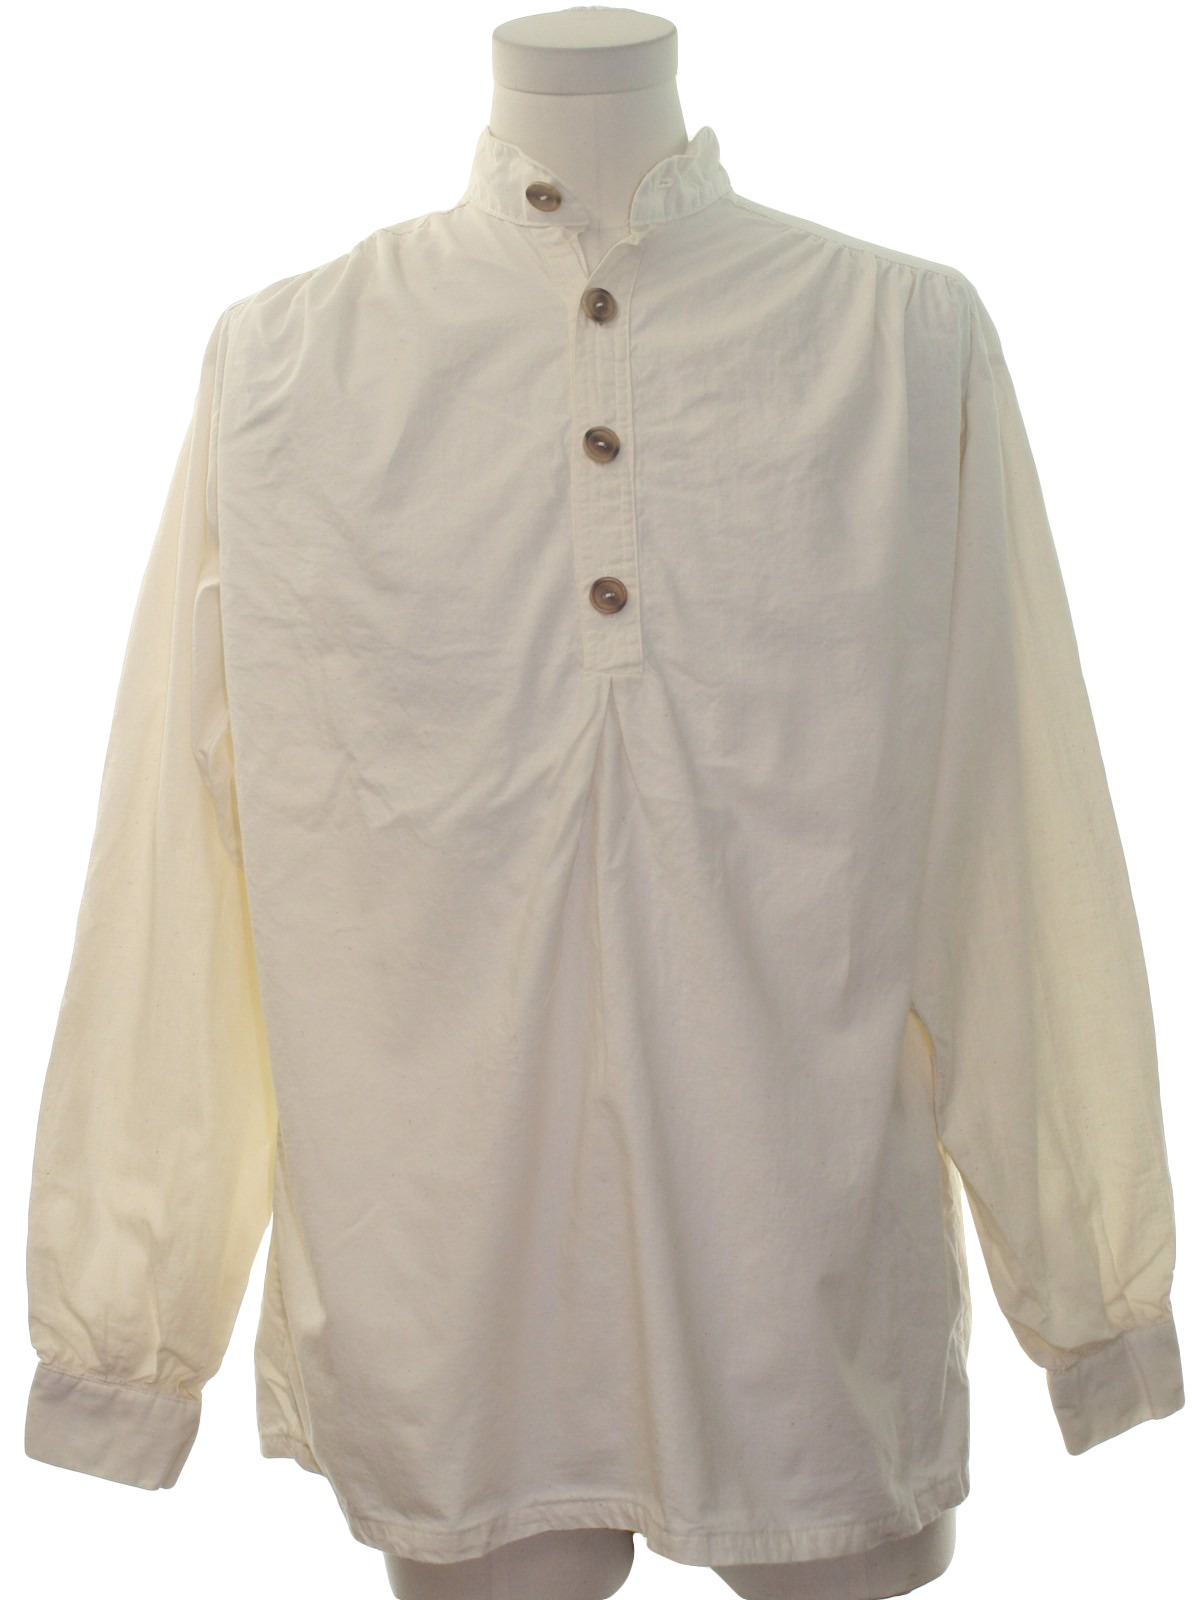 90s j peterman company western shirt pre 1920s style